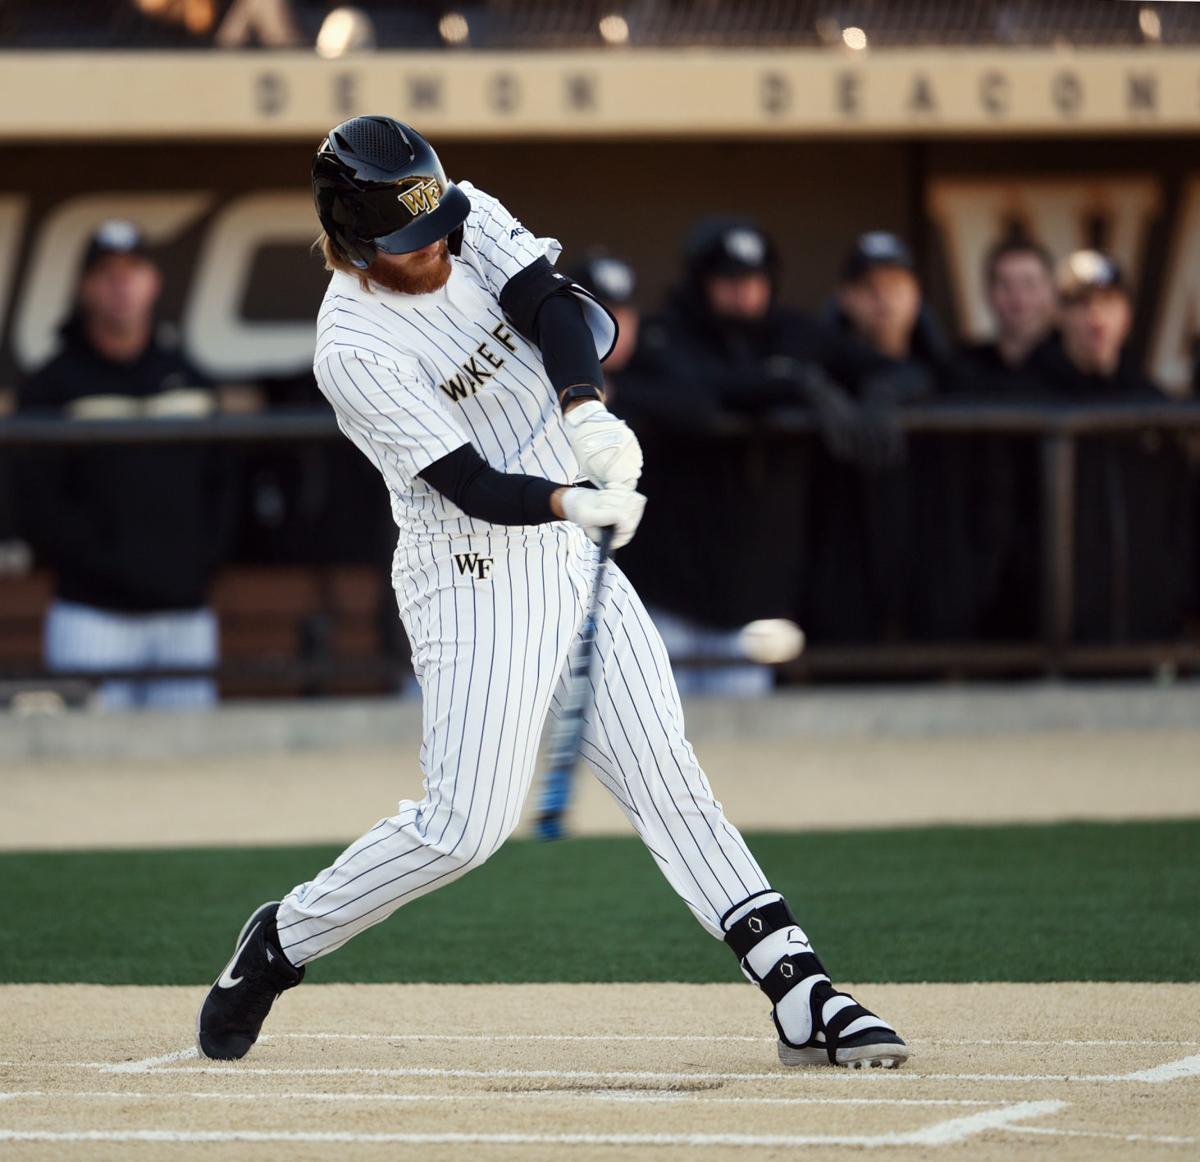 Wake Forest v. Seton Hall baseball